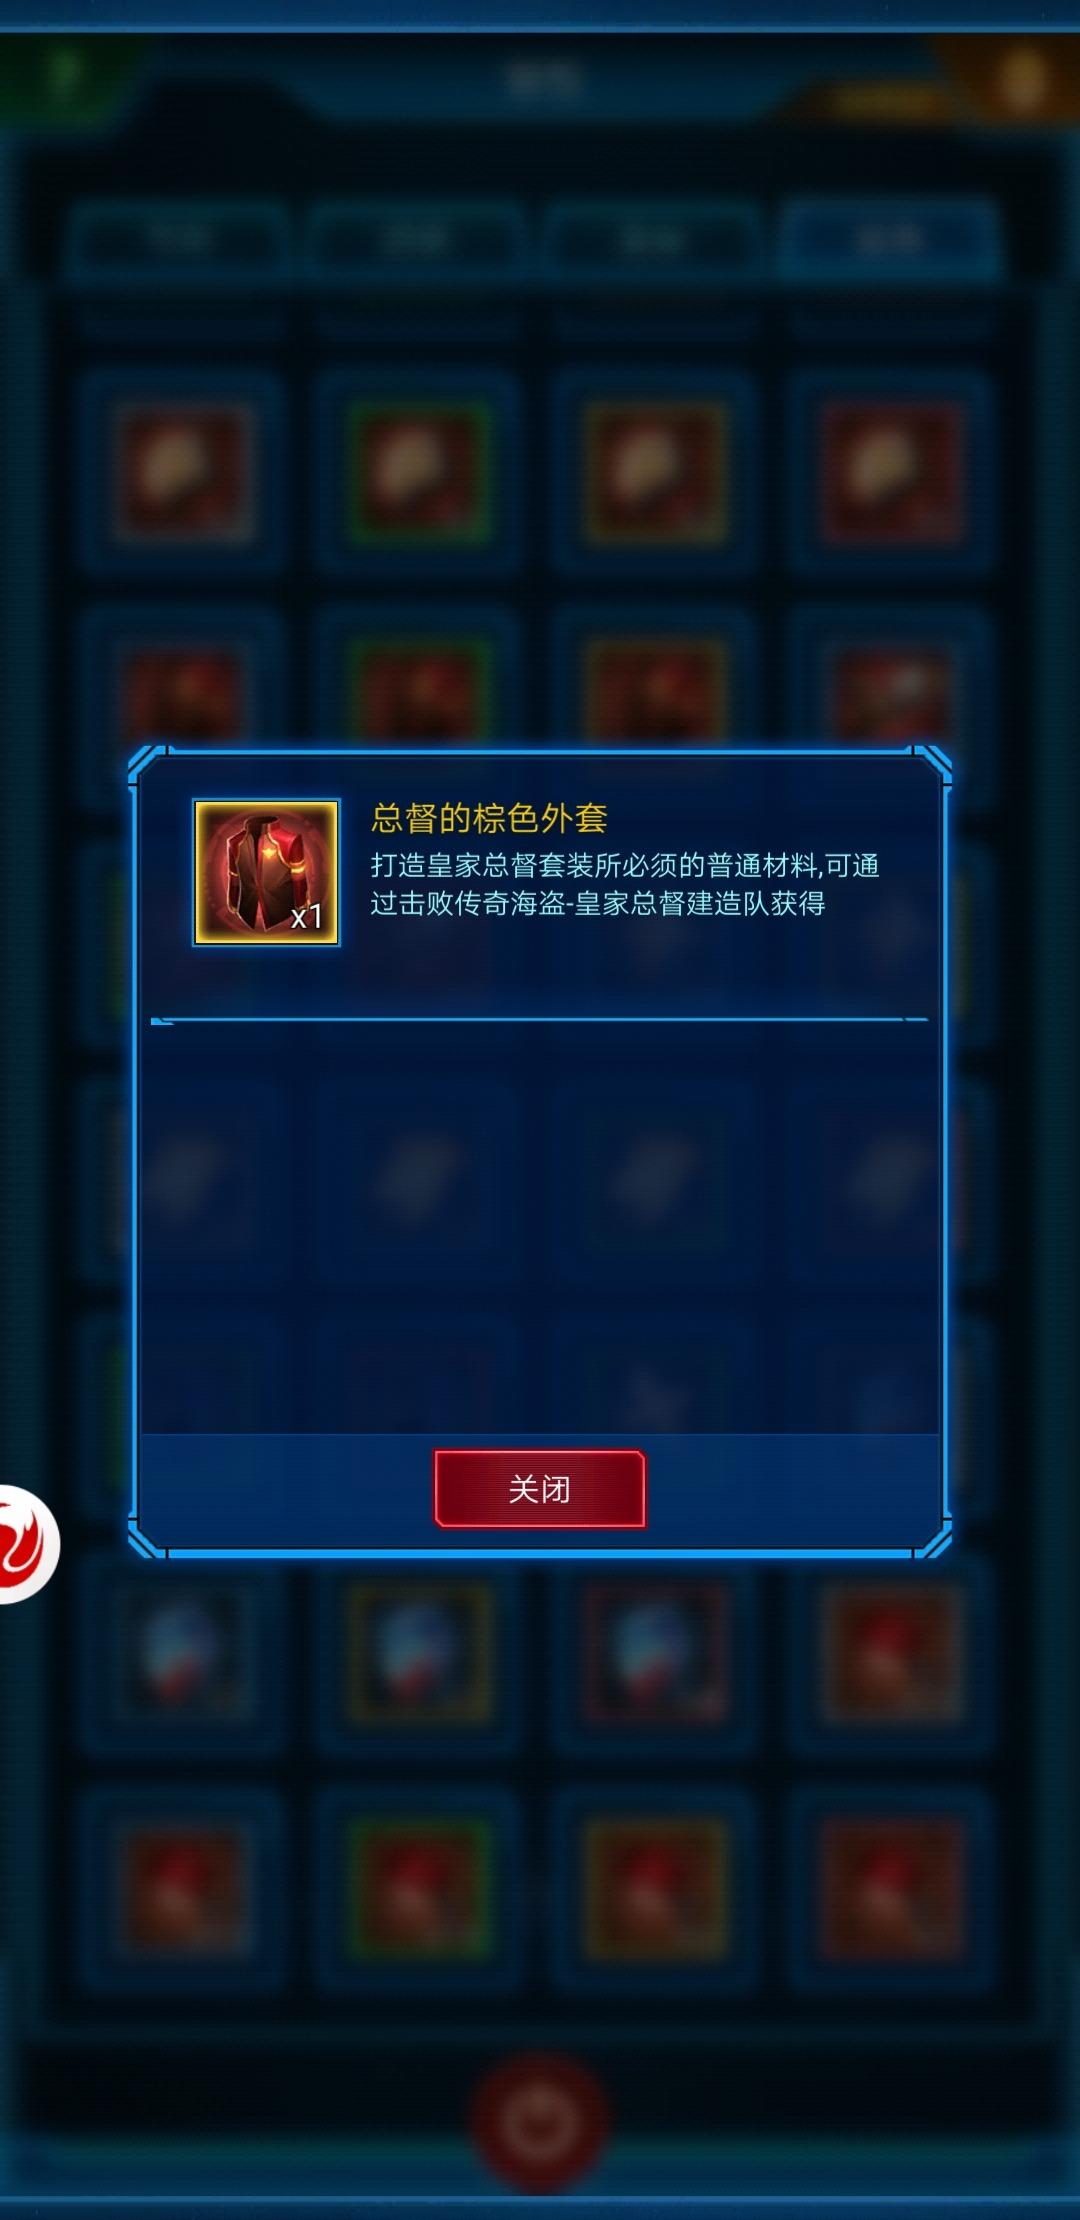 Screenshot_20190607_103114_com.jedigames.p16s.luobo.jpg